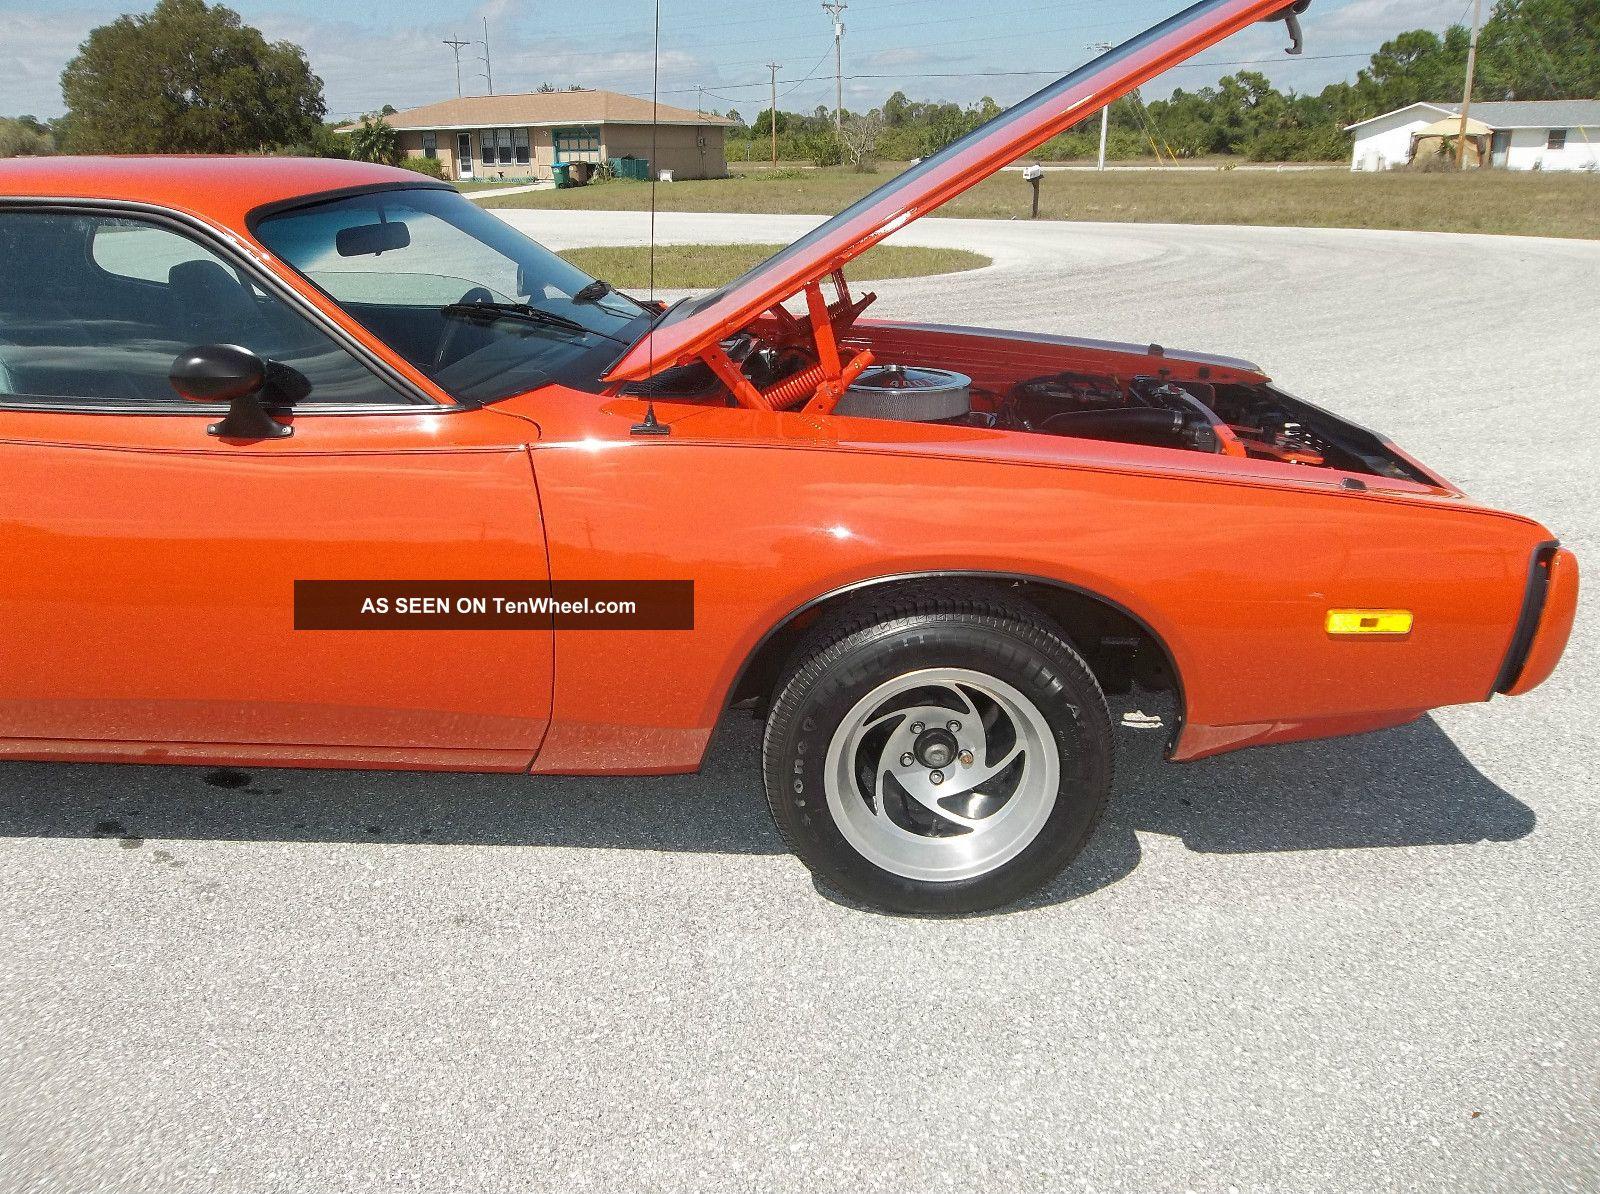 1973 Dodge Charger With Rebuilt 440 Torqueflite 3 Speed Transmission